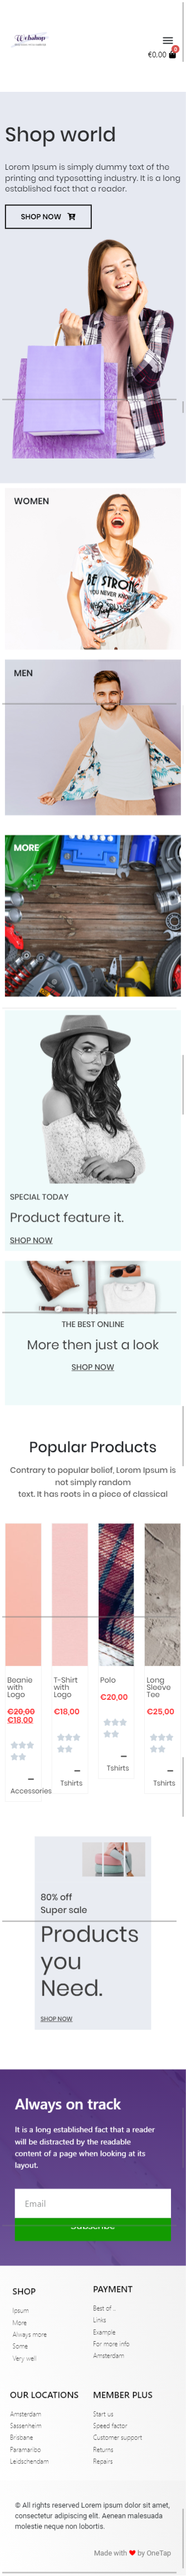 WooCommerce pakket van OneTap WordPress webshops mobiel